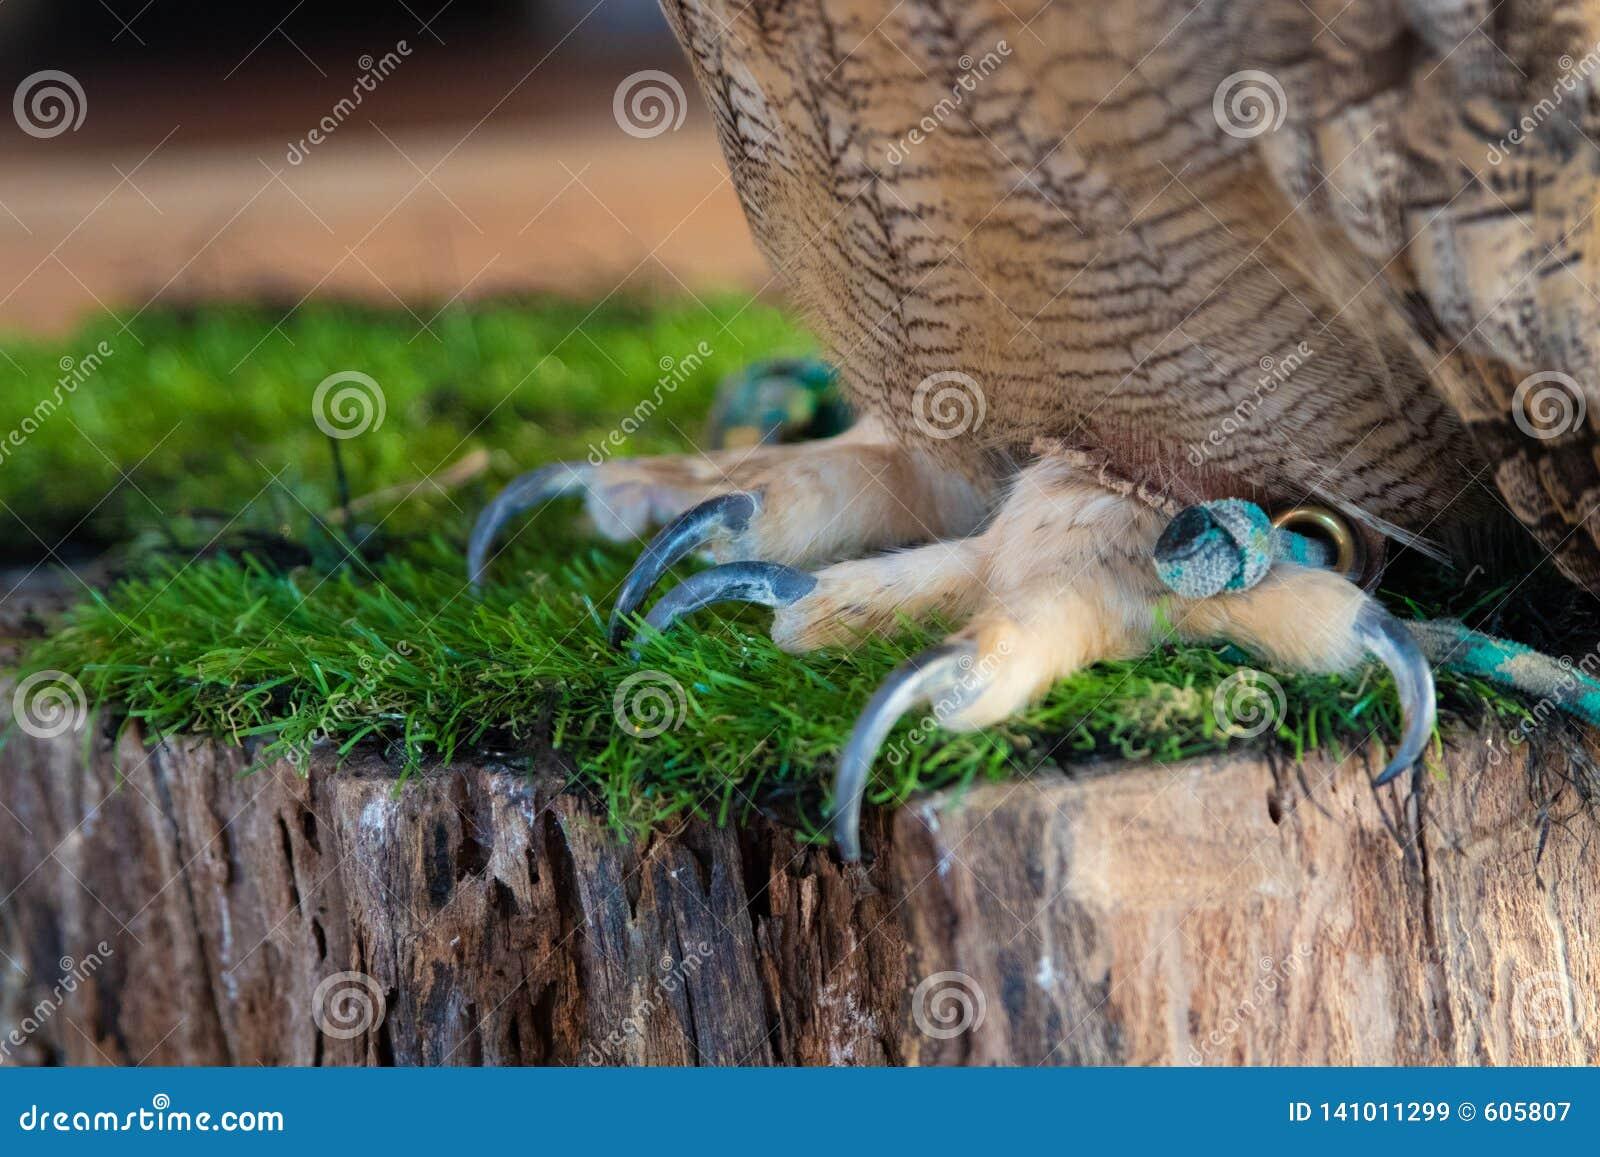 The Eurasian eagle-owl claws. The Eurasian eagle-owl claws, species of eagle-owl resident in much of Eurasia. Place for